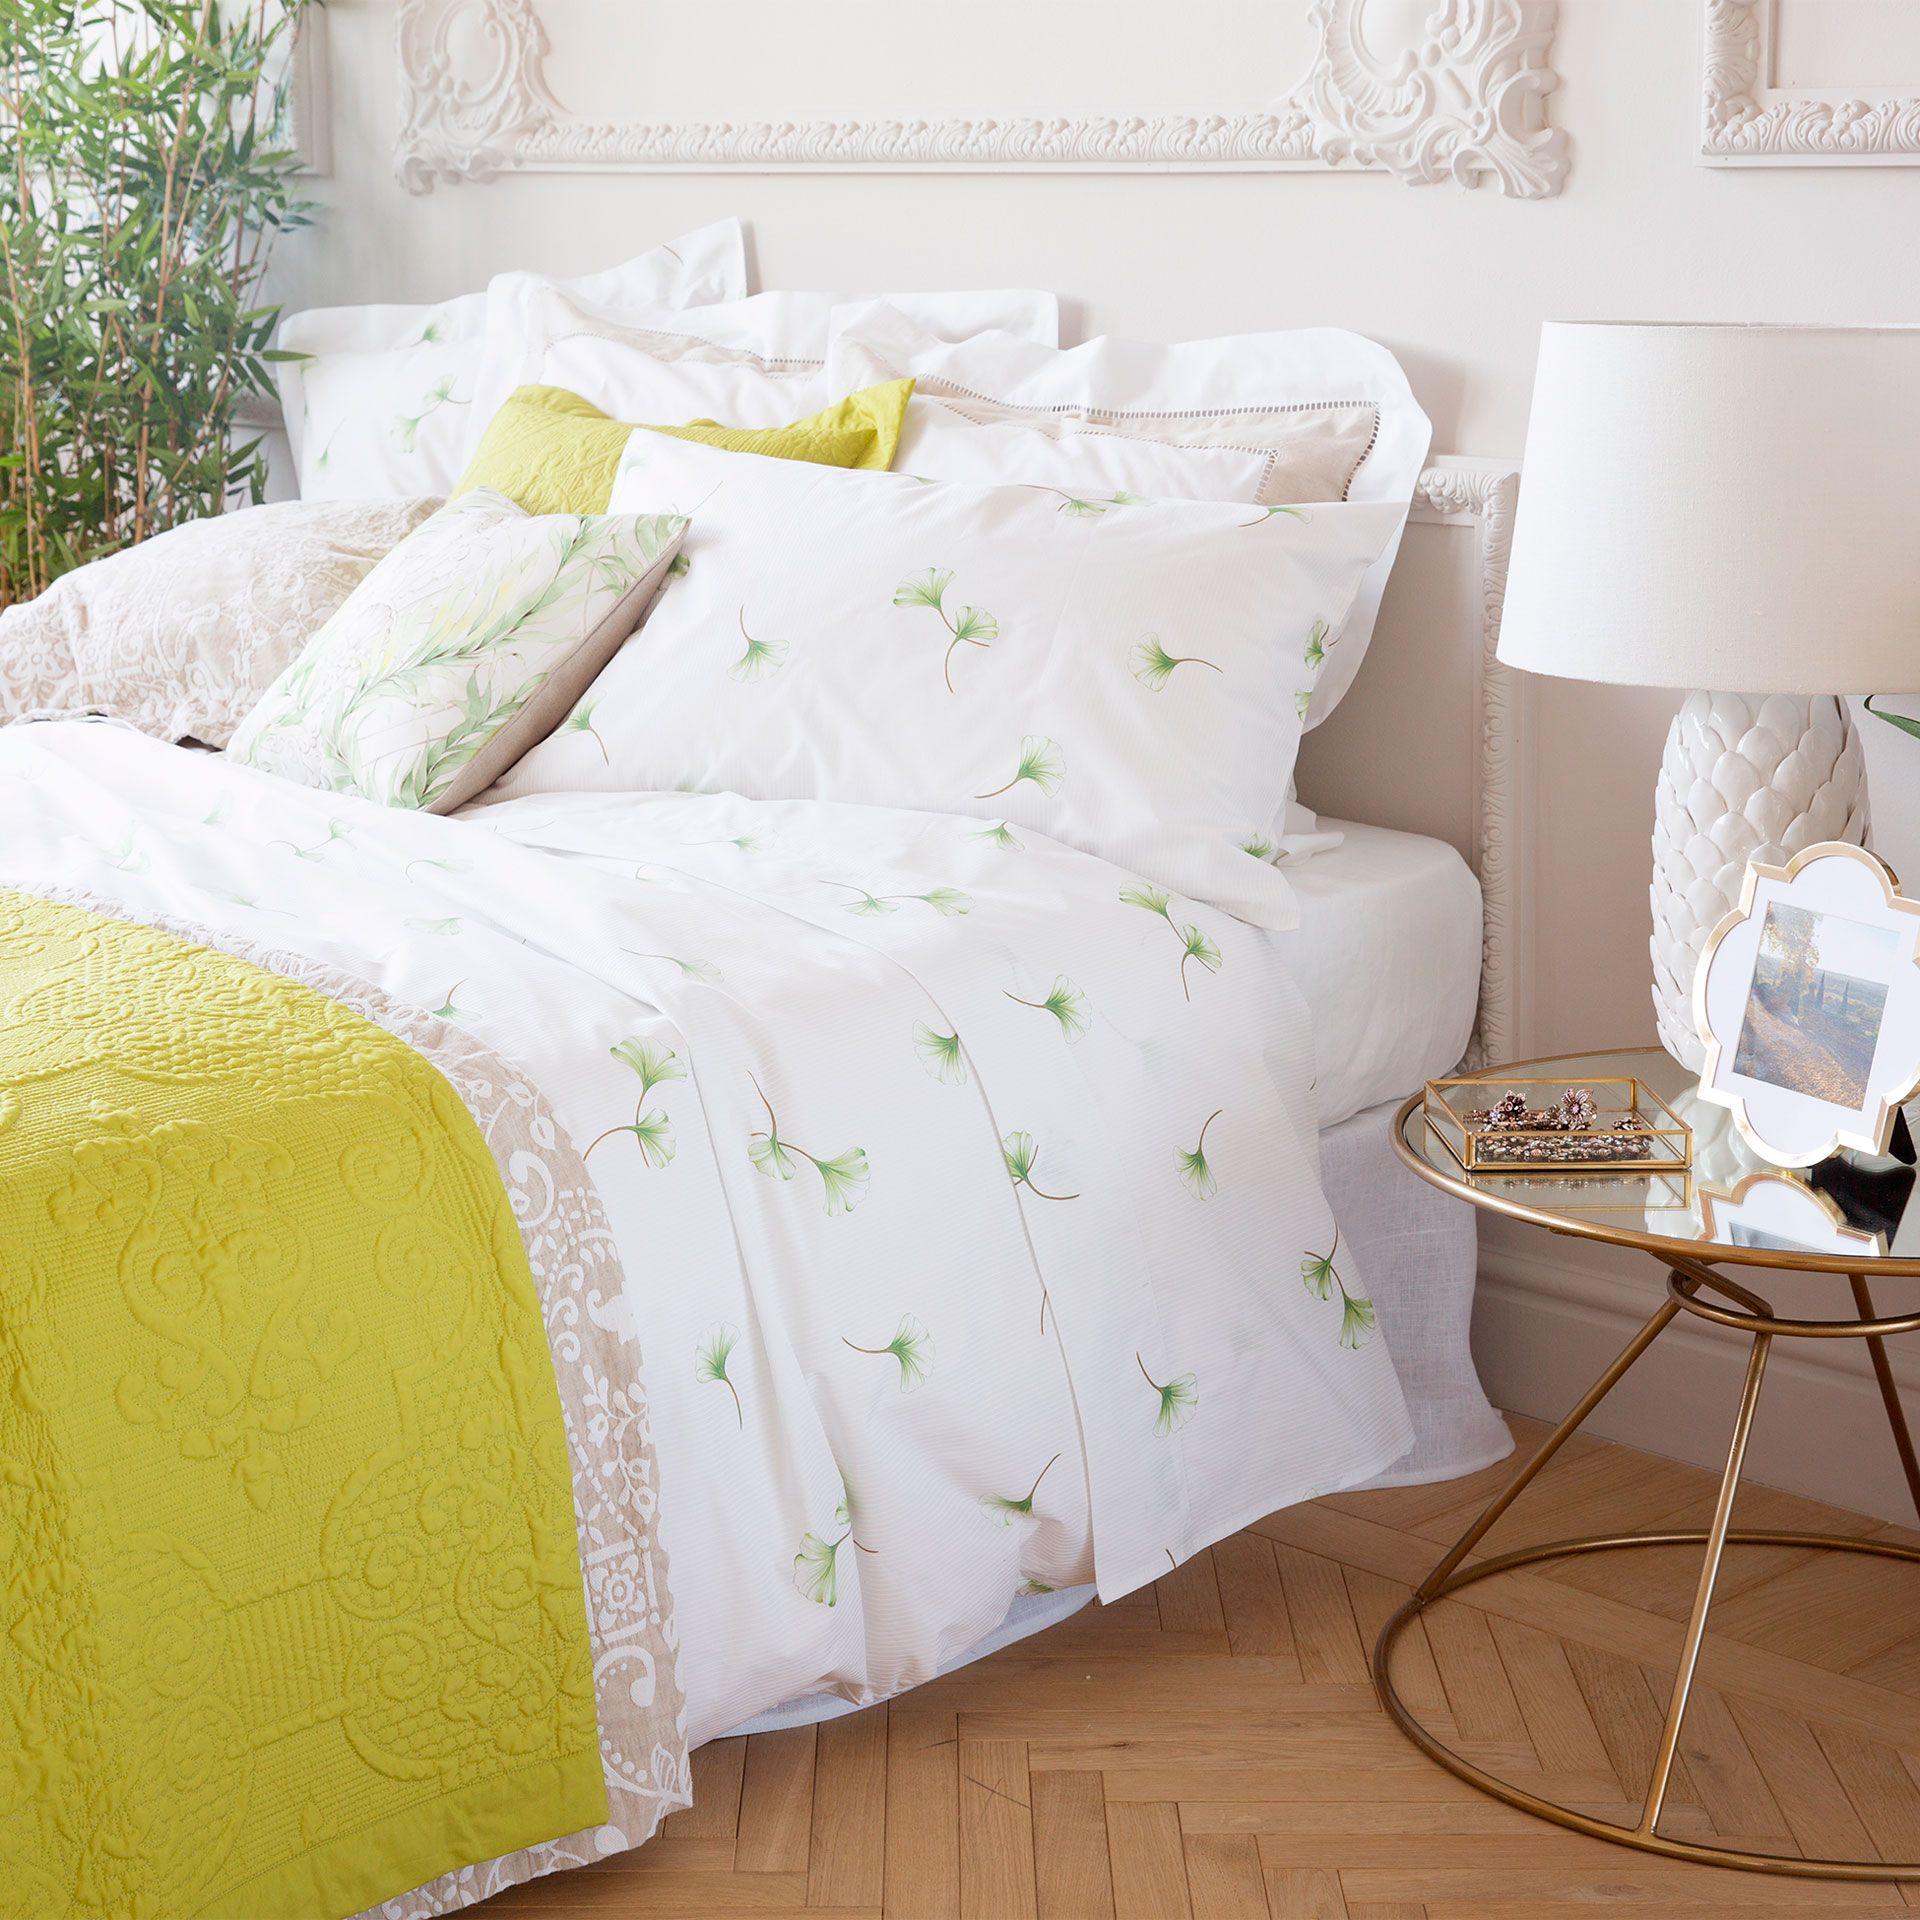 LEAF-PRINT PERCALE BEDDING - Bedding - Bedroom